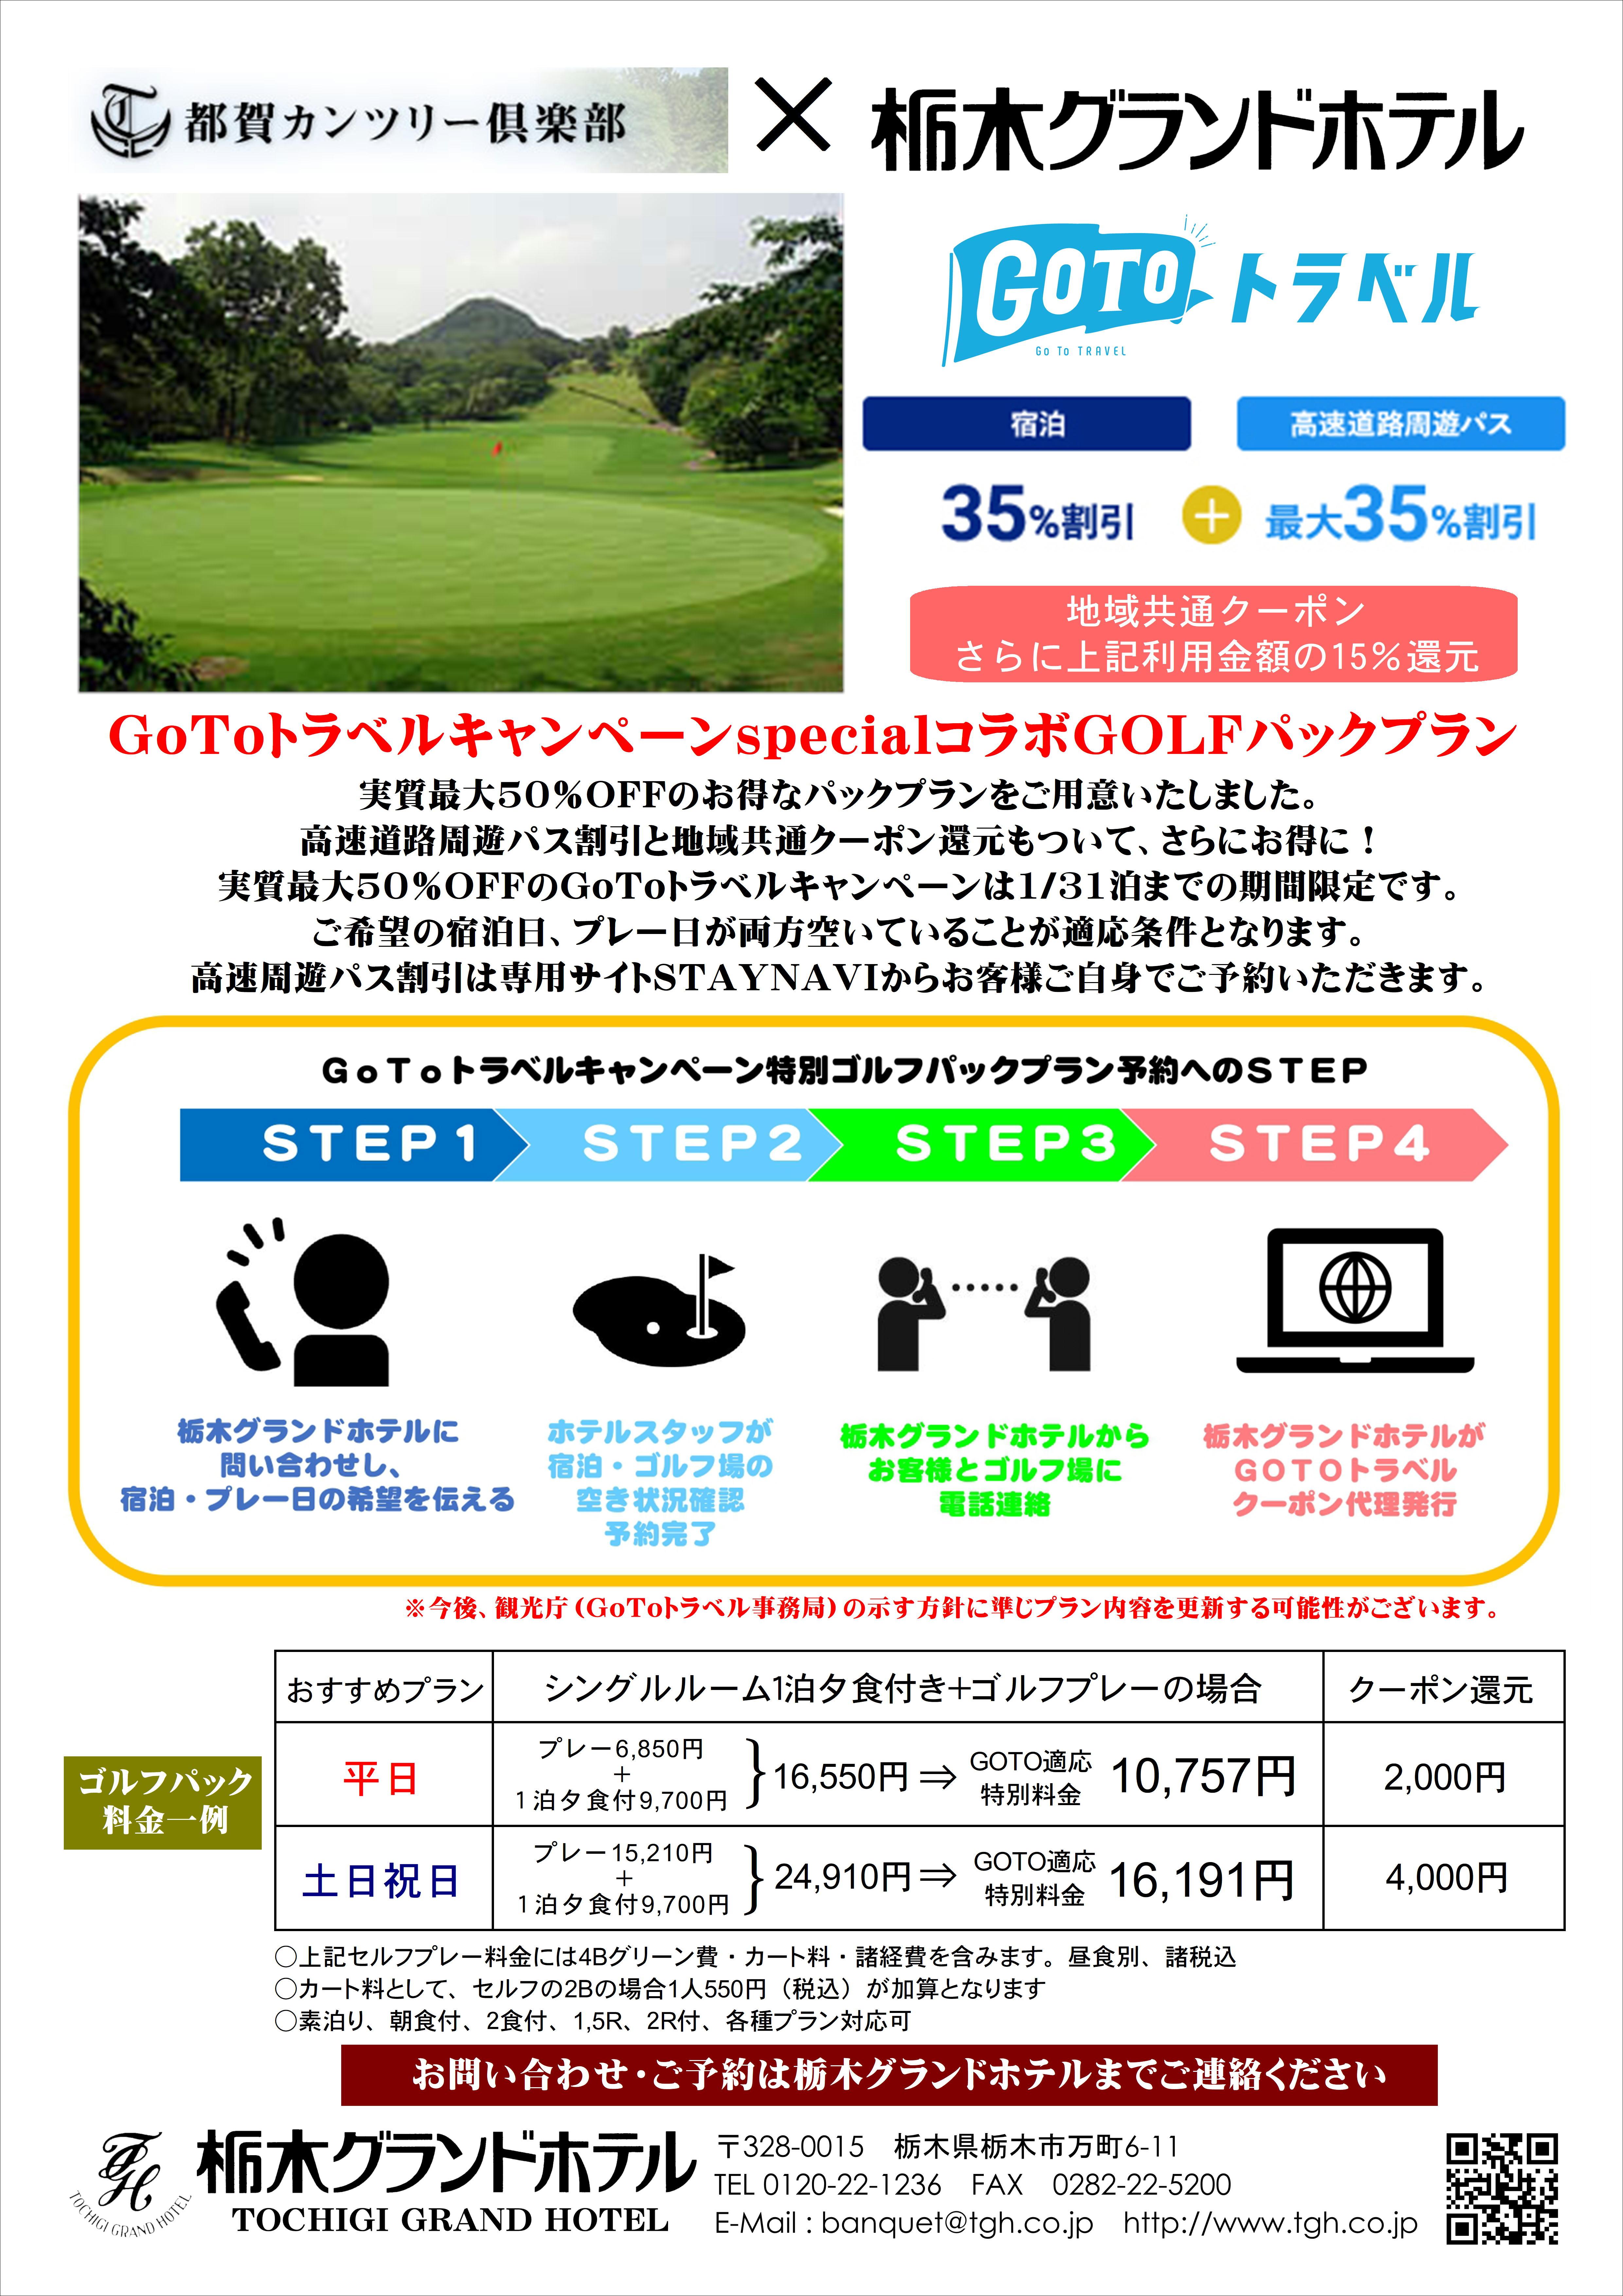 http://www.tgh.co.jp/contents/news/%E9%83%BD%E8%B3%80%E3%82%AB%E3%83%B3%E3%83%84%E3%83%AA%E3%83%BC%E5%80%B6%E6%A5%BD%E9%83%A8.jpg